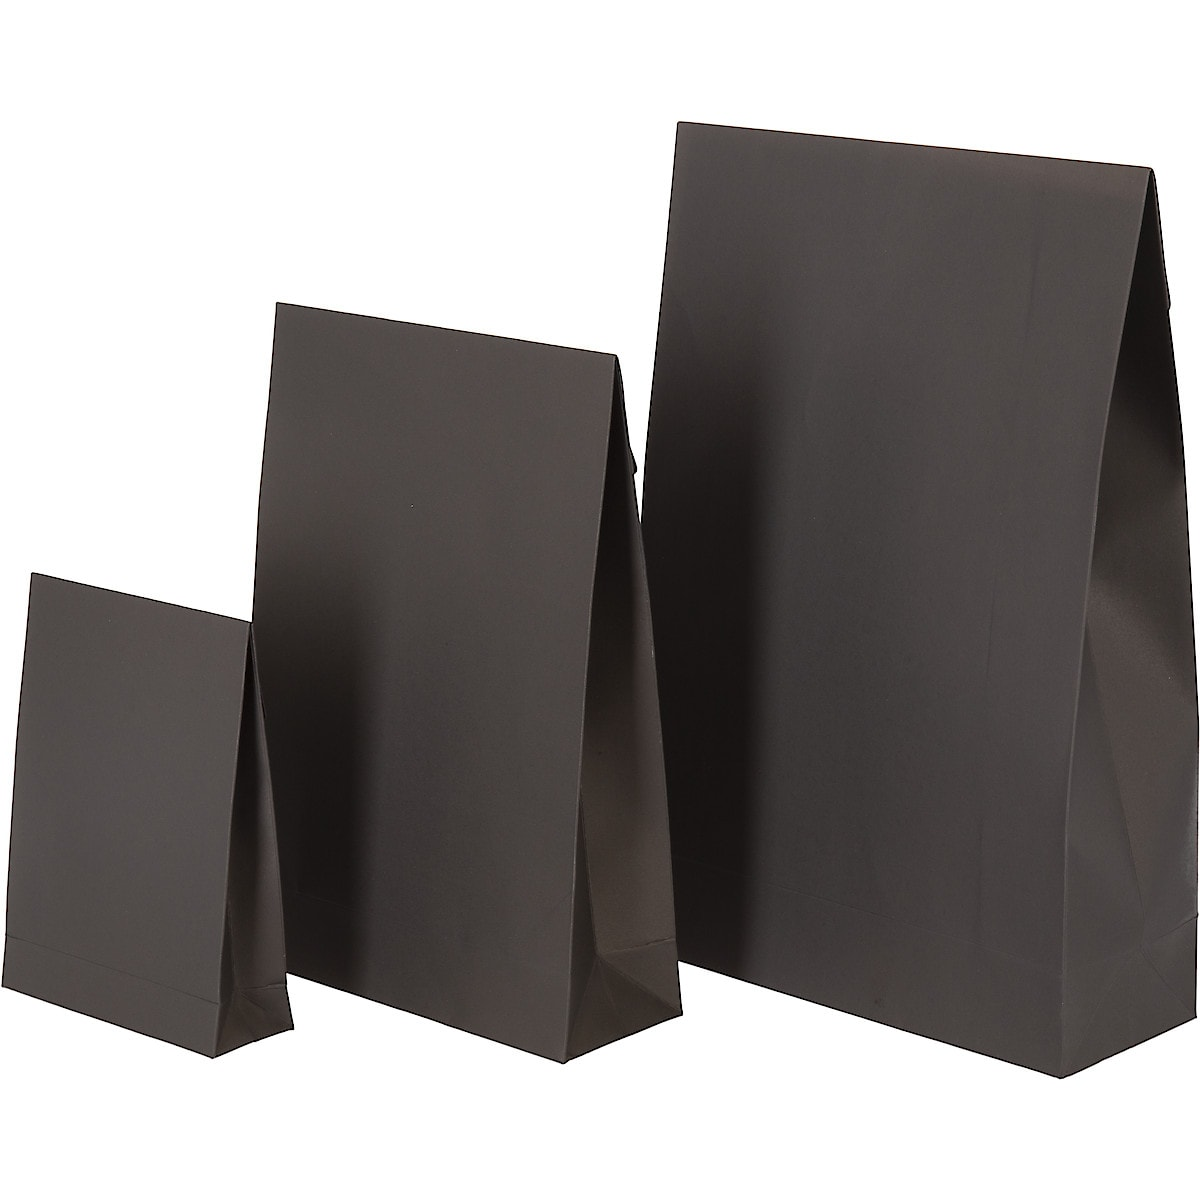 Set of 3 Gift Bags, Black